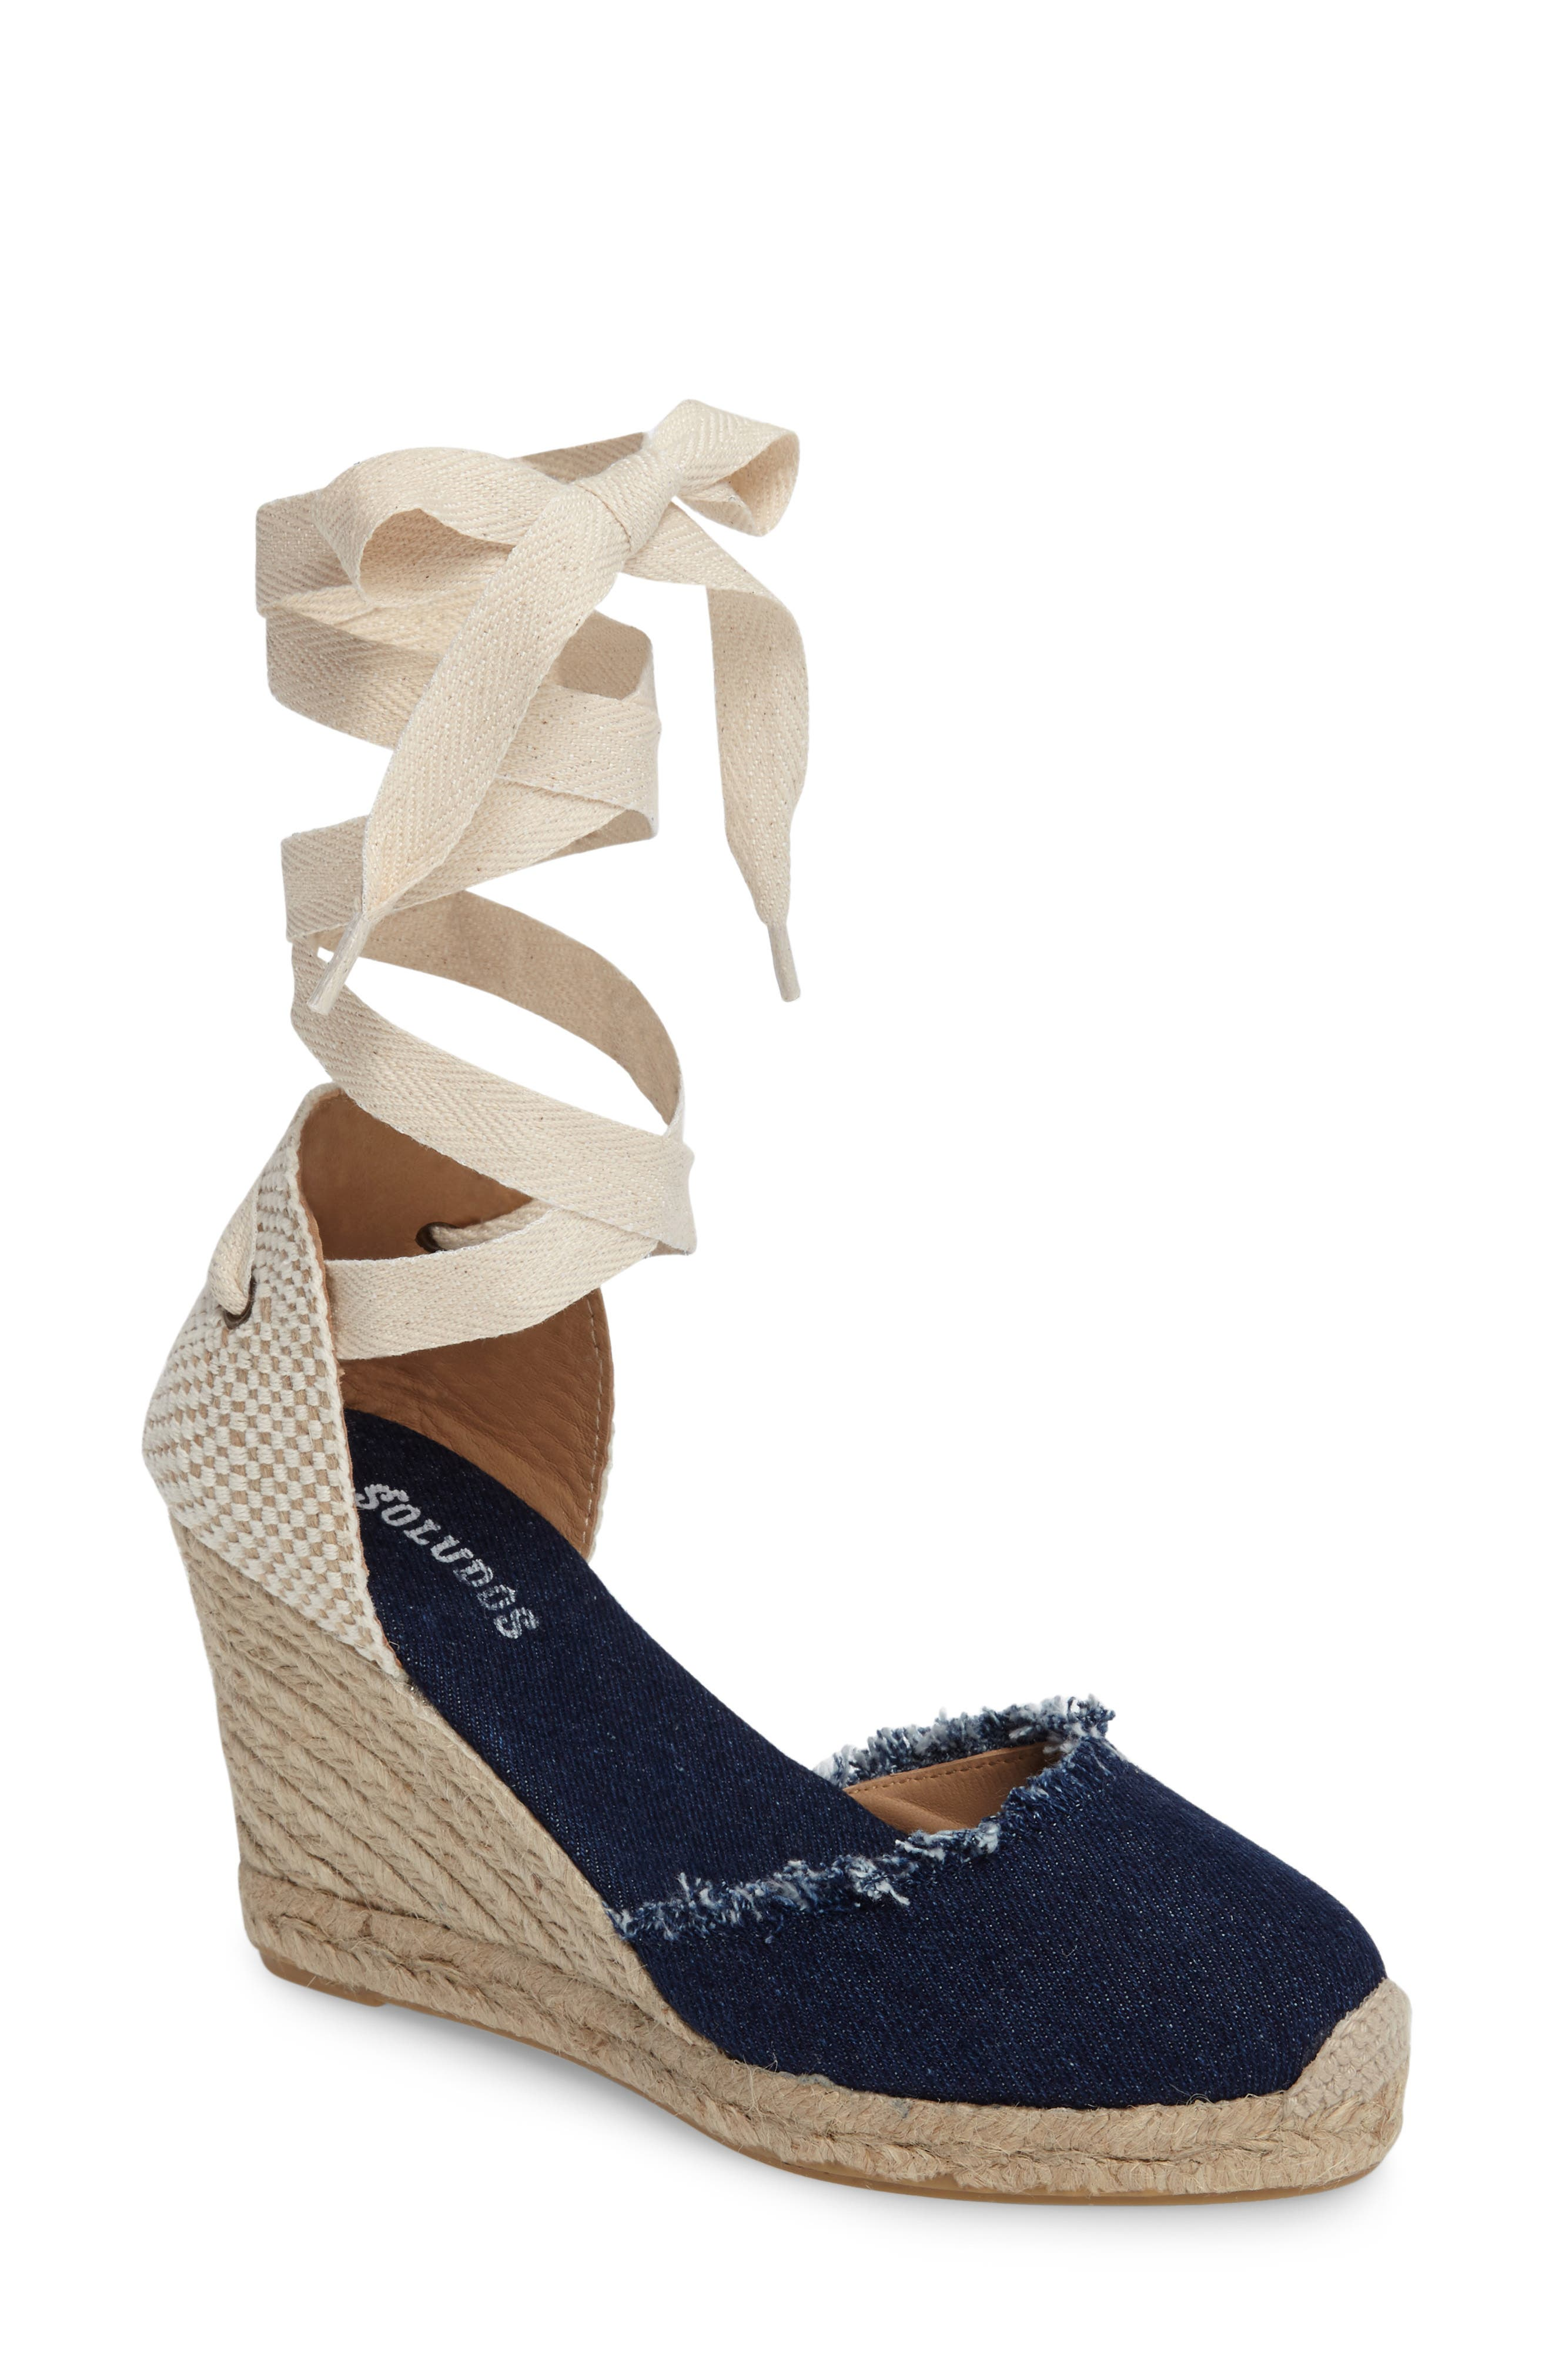 Wedge Lace-Up Espadrille Sandal,                             Main thumbnail 1, color,                             Dark Denim